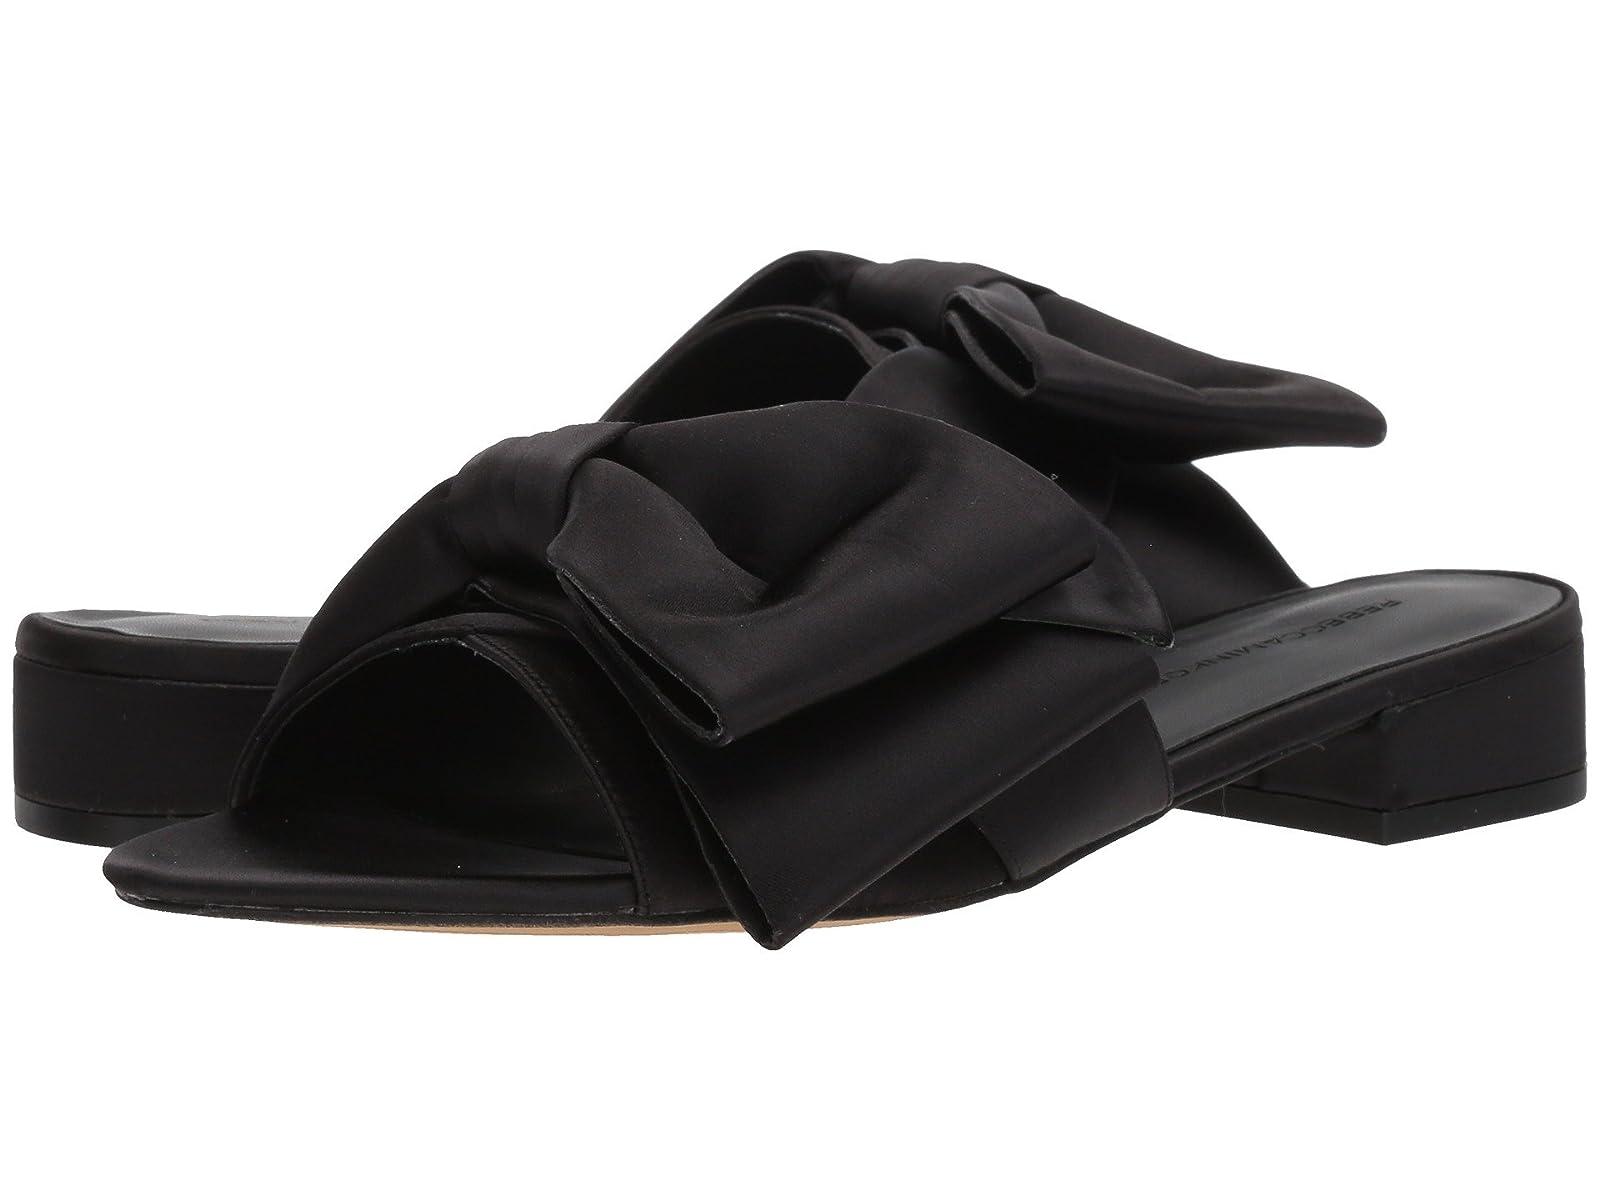 Rebecca Minkoff Calista SlideAtmospheric grades have affordable shoes